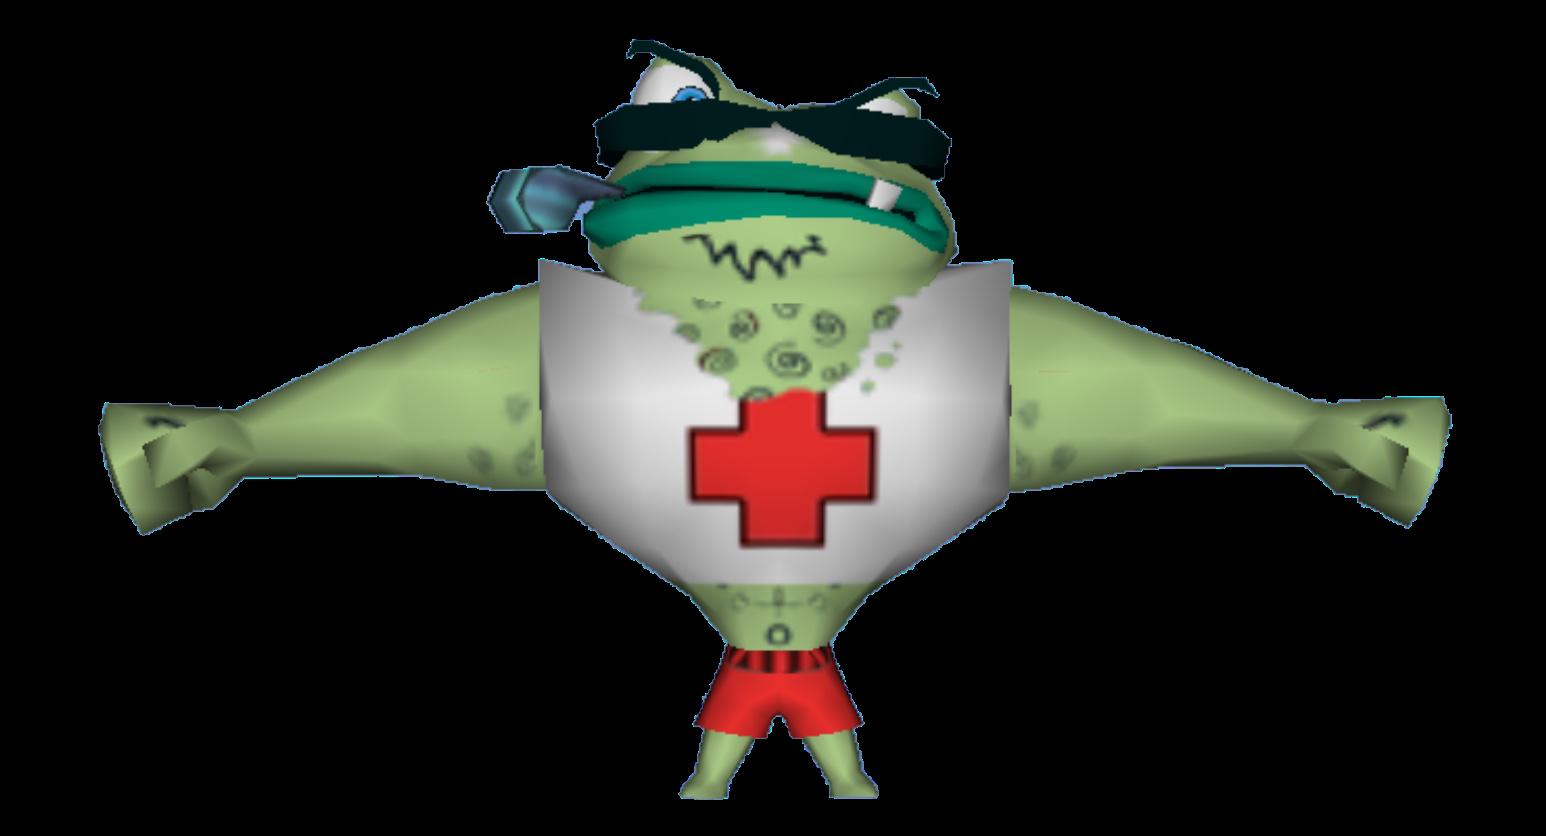 Lifeguard (Revenge of the Flying Dutchman)